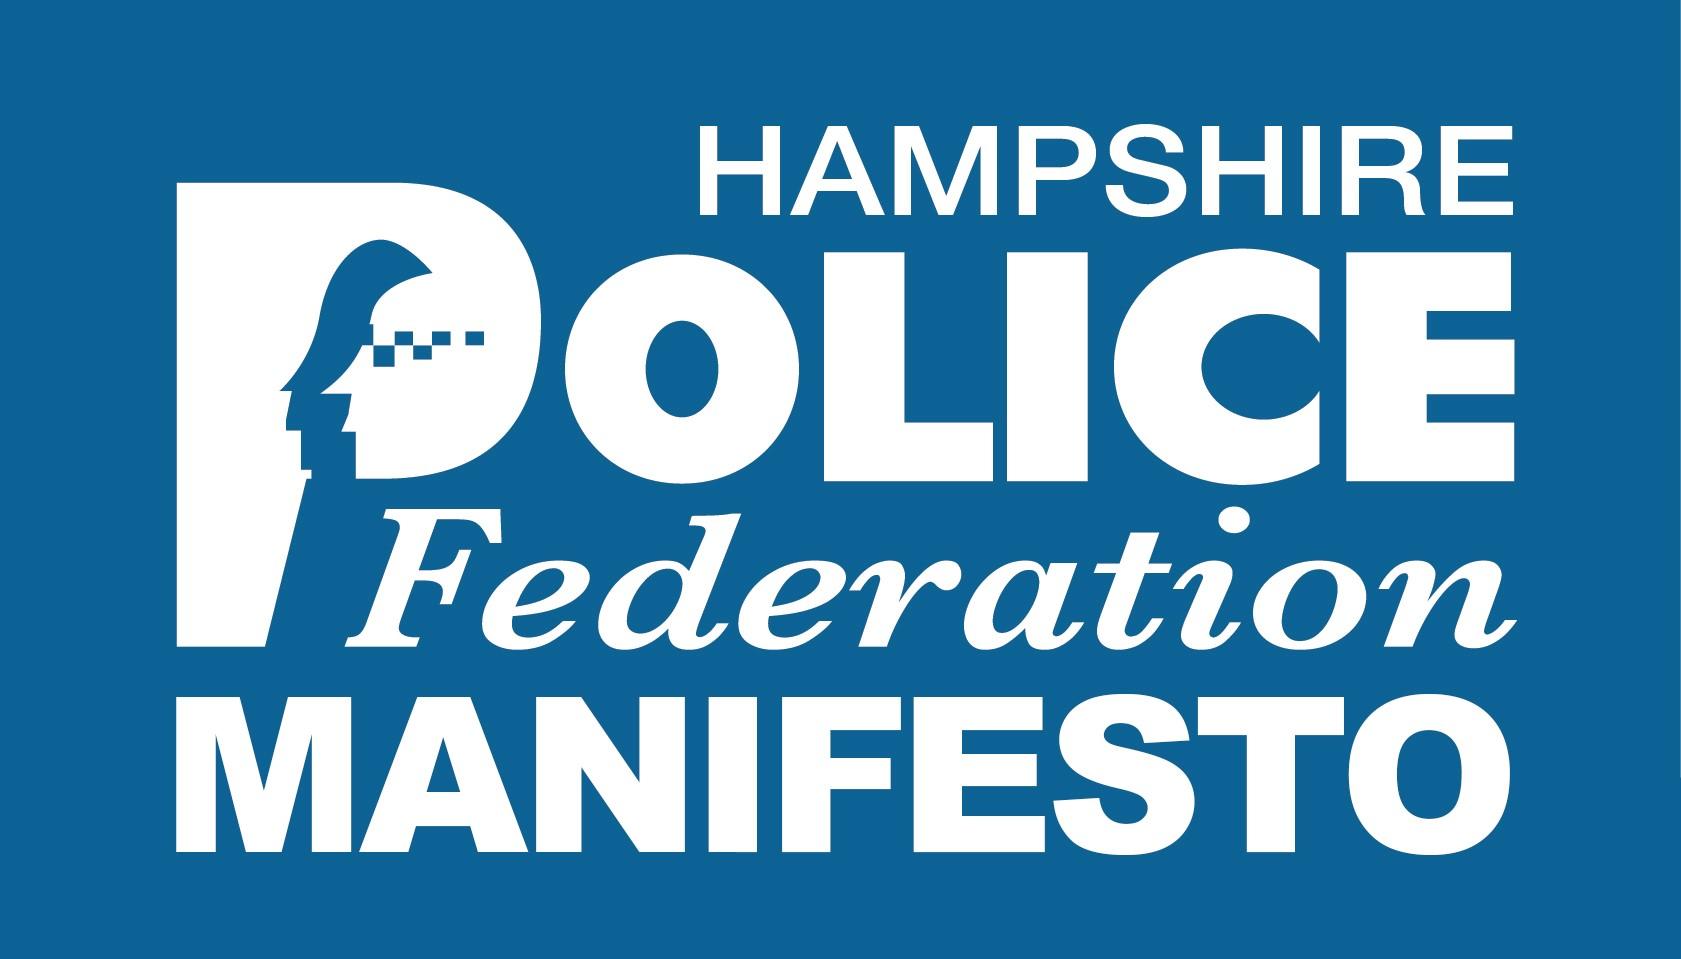 Hampshire manifesto